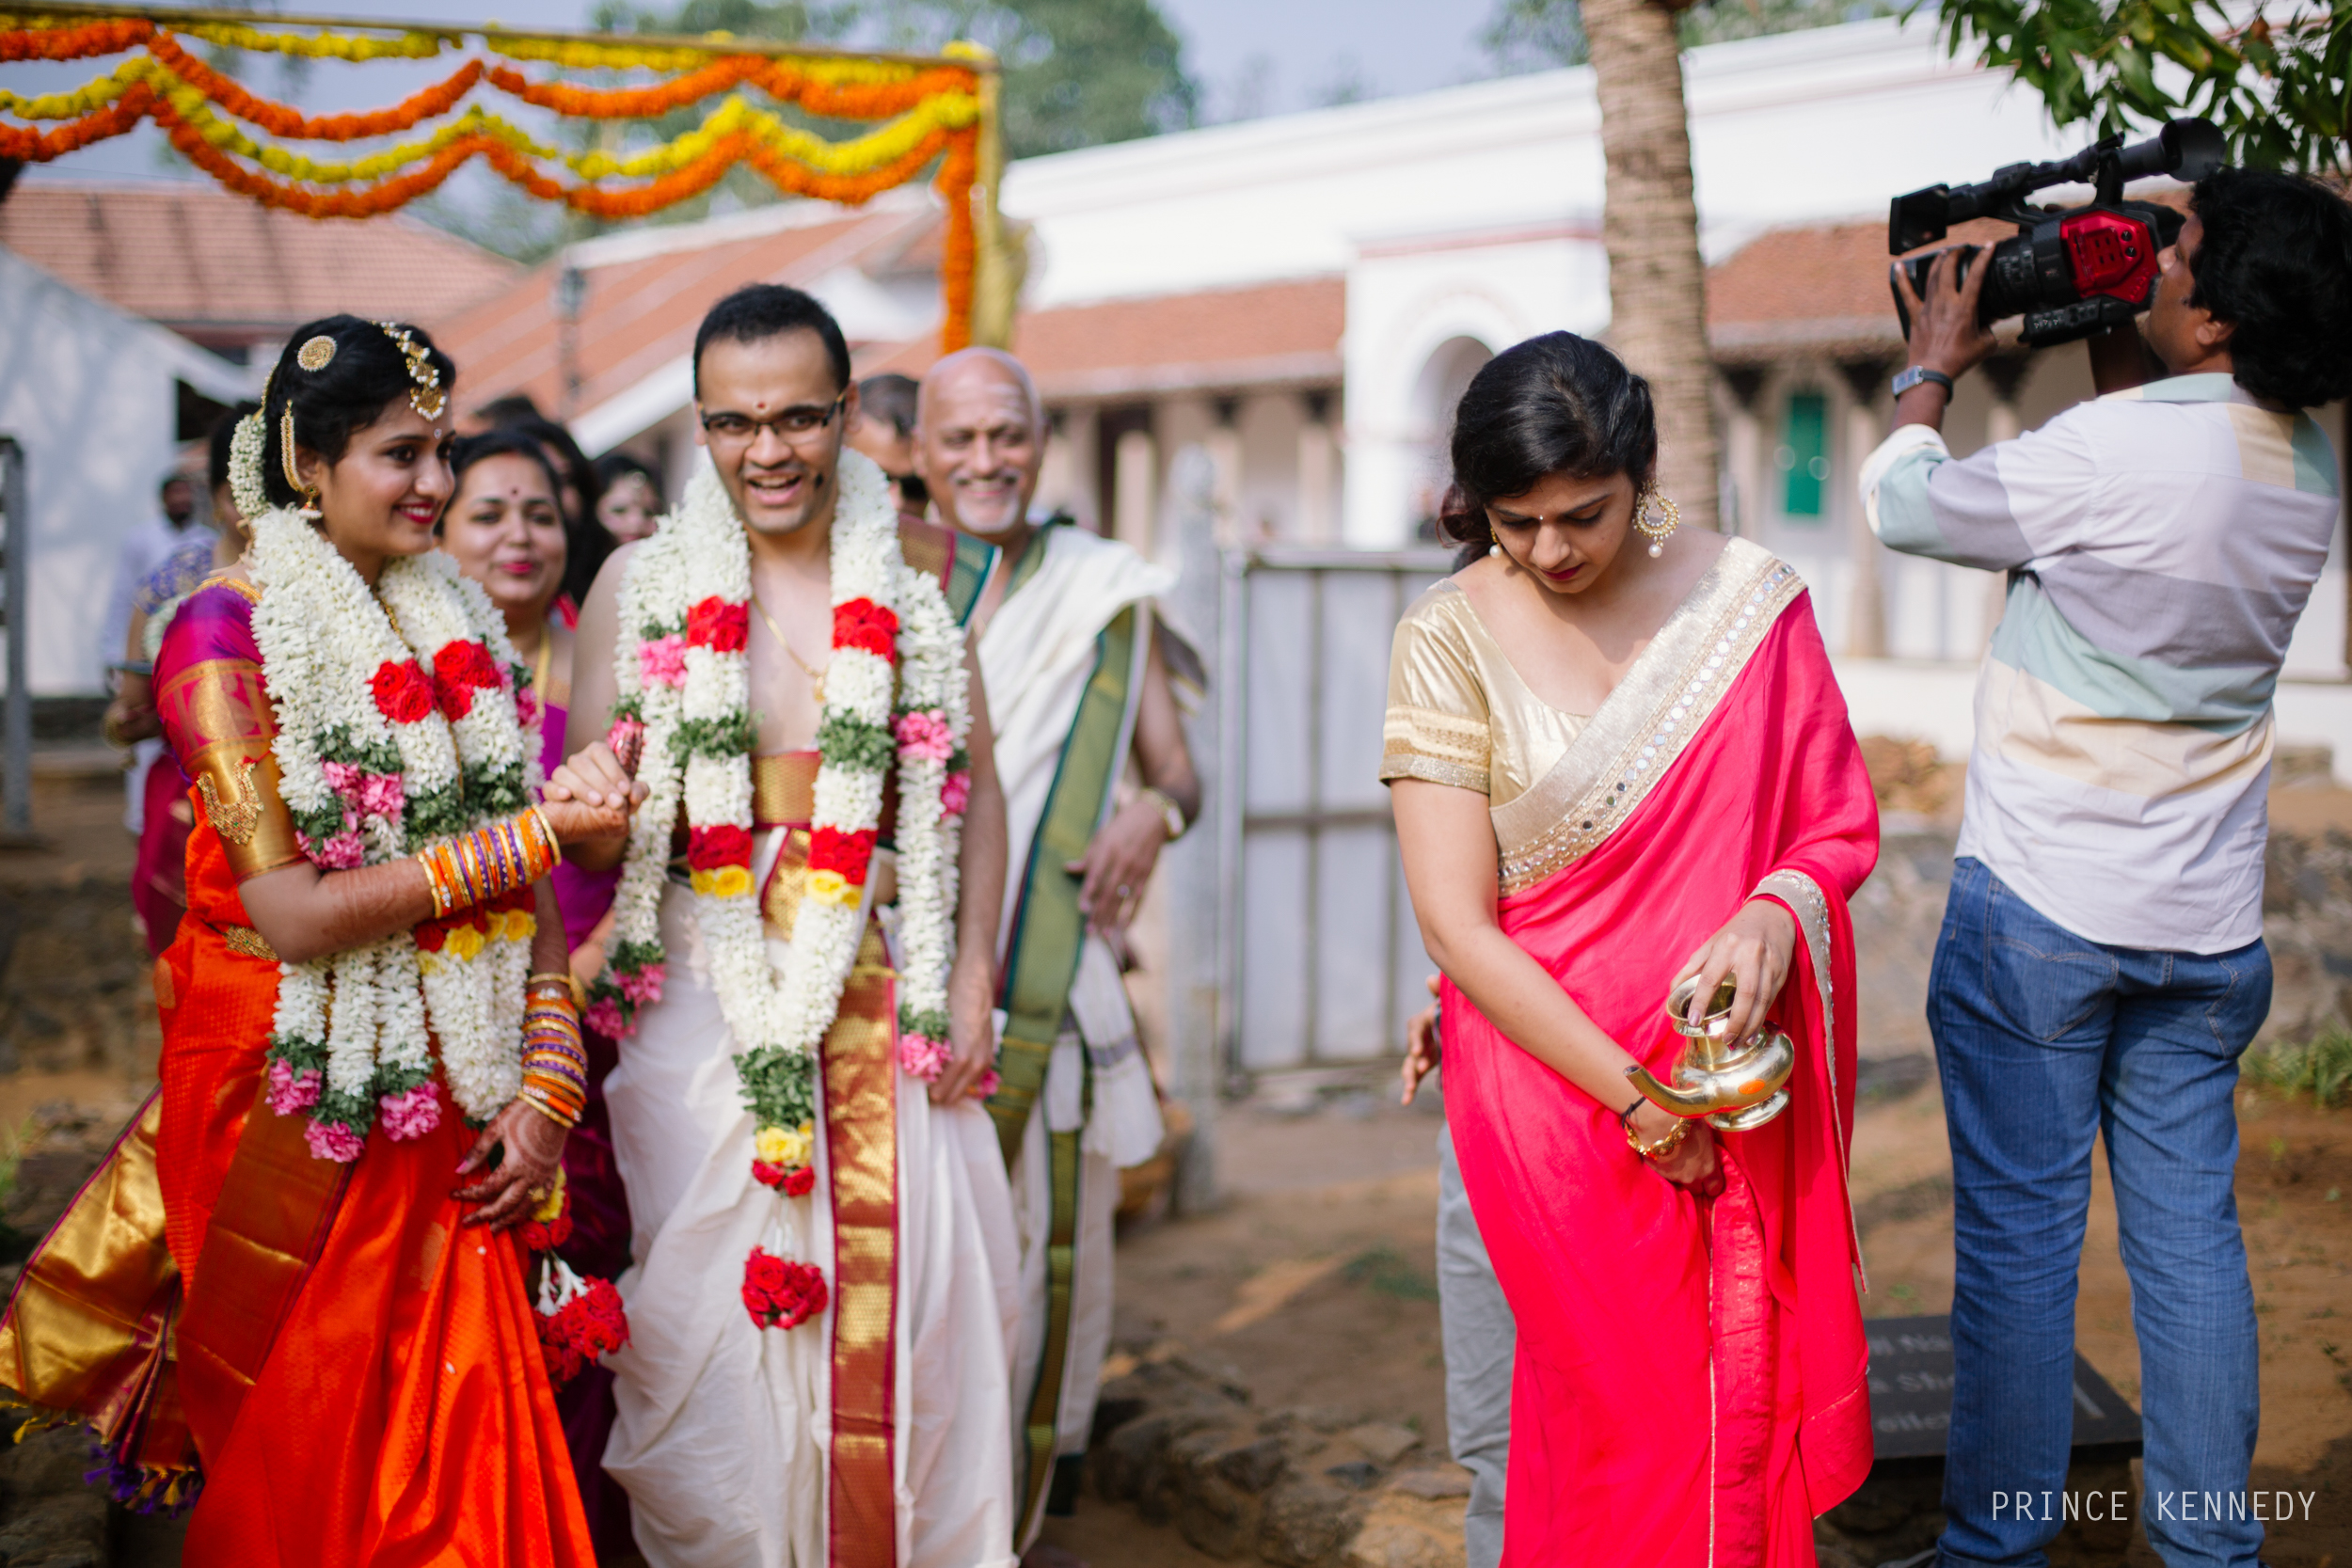 Athmajja-Nithesh-Engagement-Couple-Portrait-Portraiture-Wedding-Couple-Portrait-Chennai-Photographer-Candid-Photography-Destination-Best-Prince-Kennedy-Photography-195.jpg